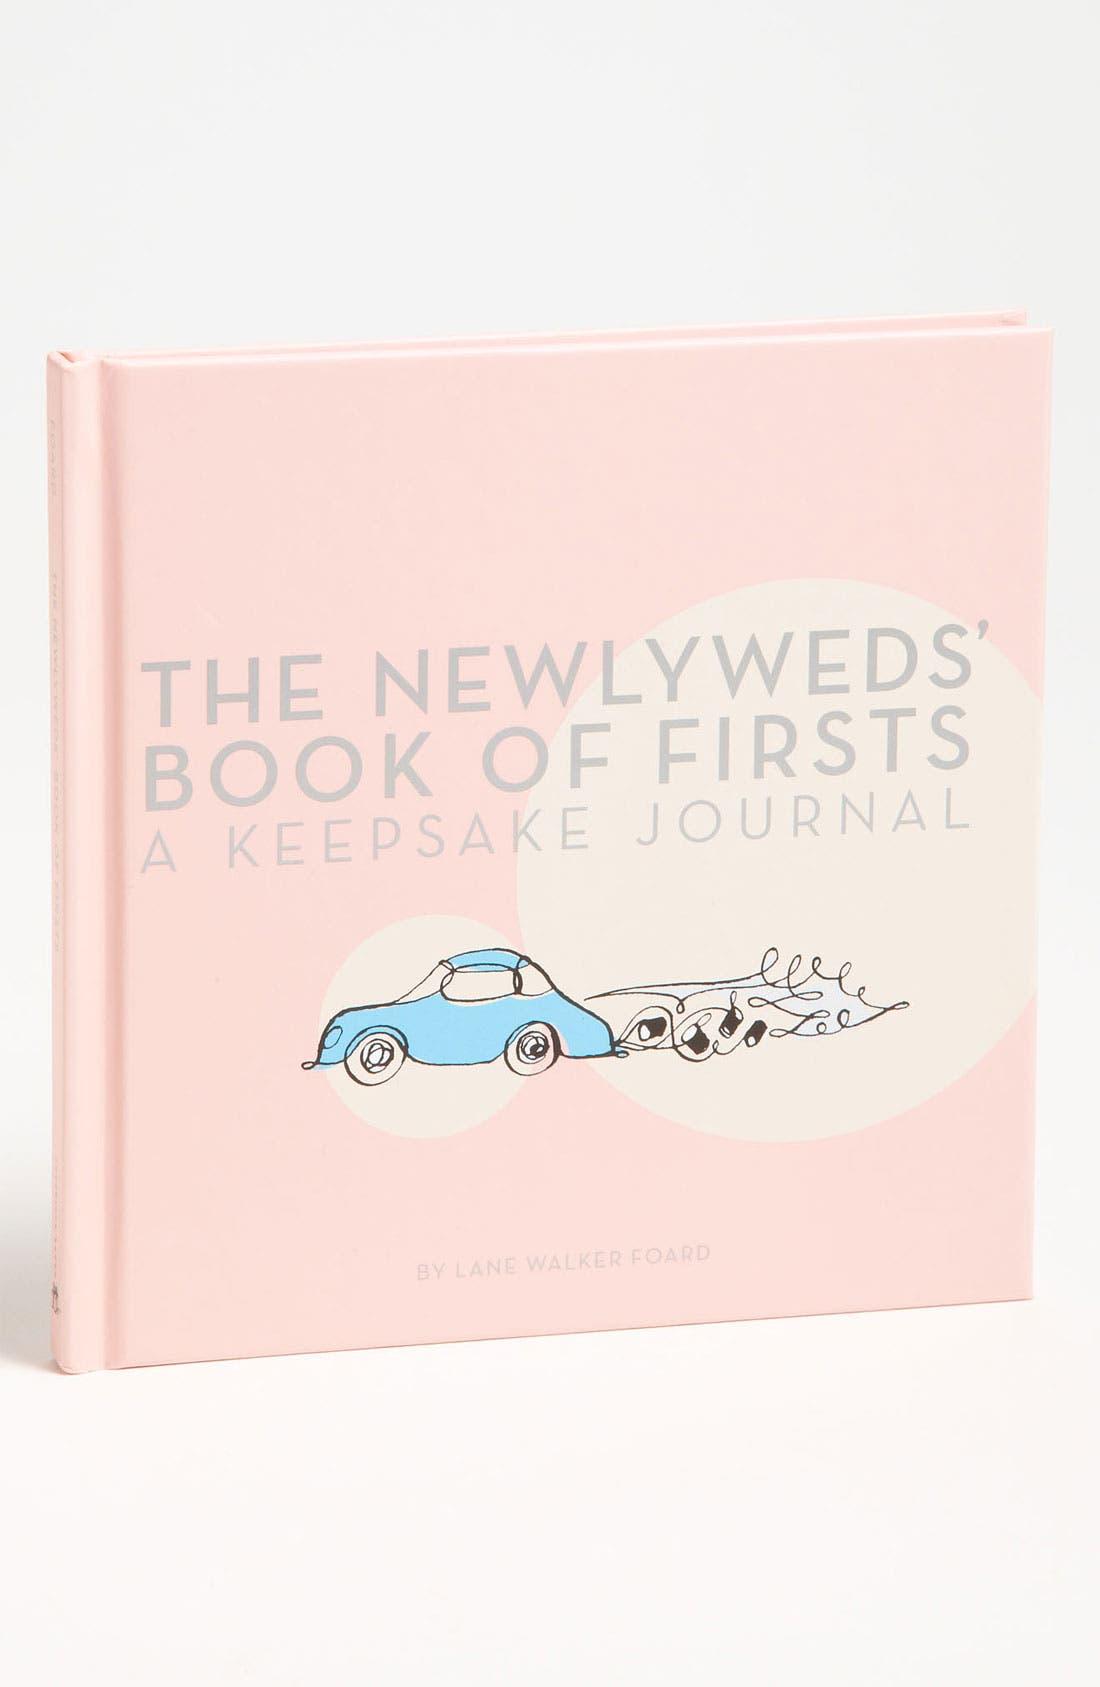 Lane Walker Foard 'The Newlyweds' Book of Firsts' Keepsake Journal,                             Main thumbnail 1, color,                             960